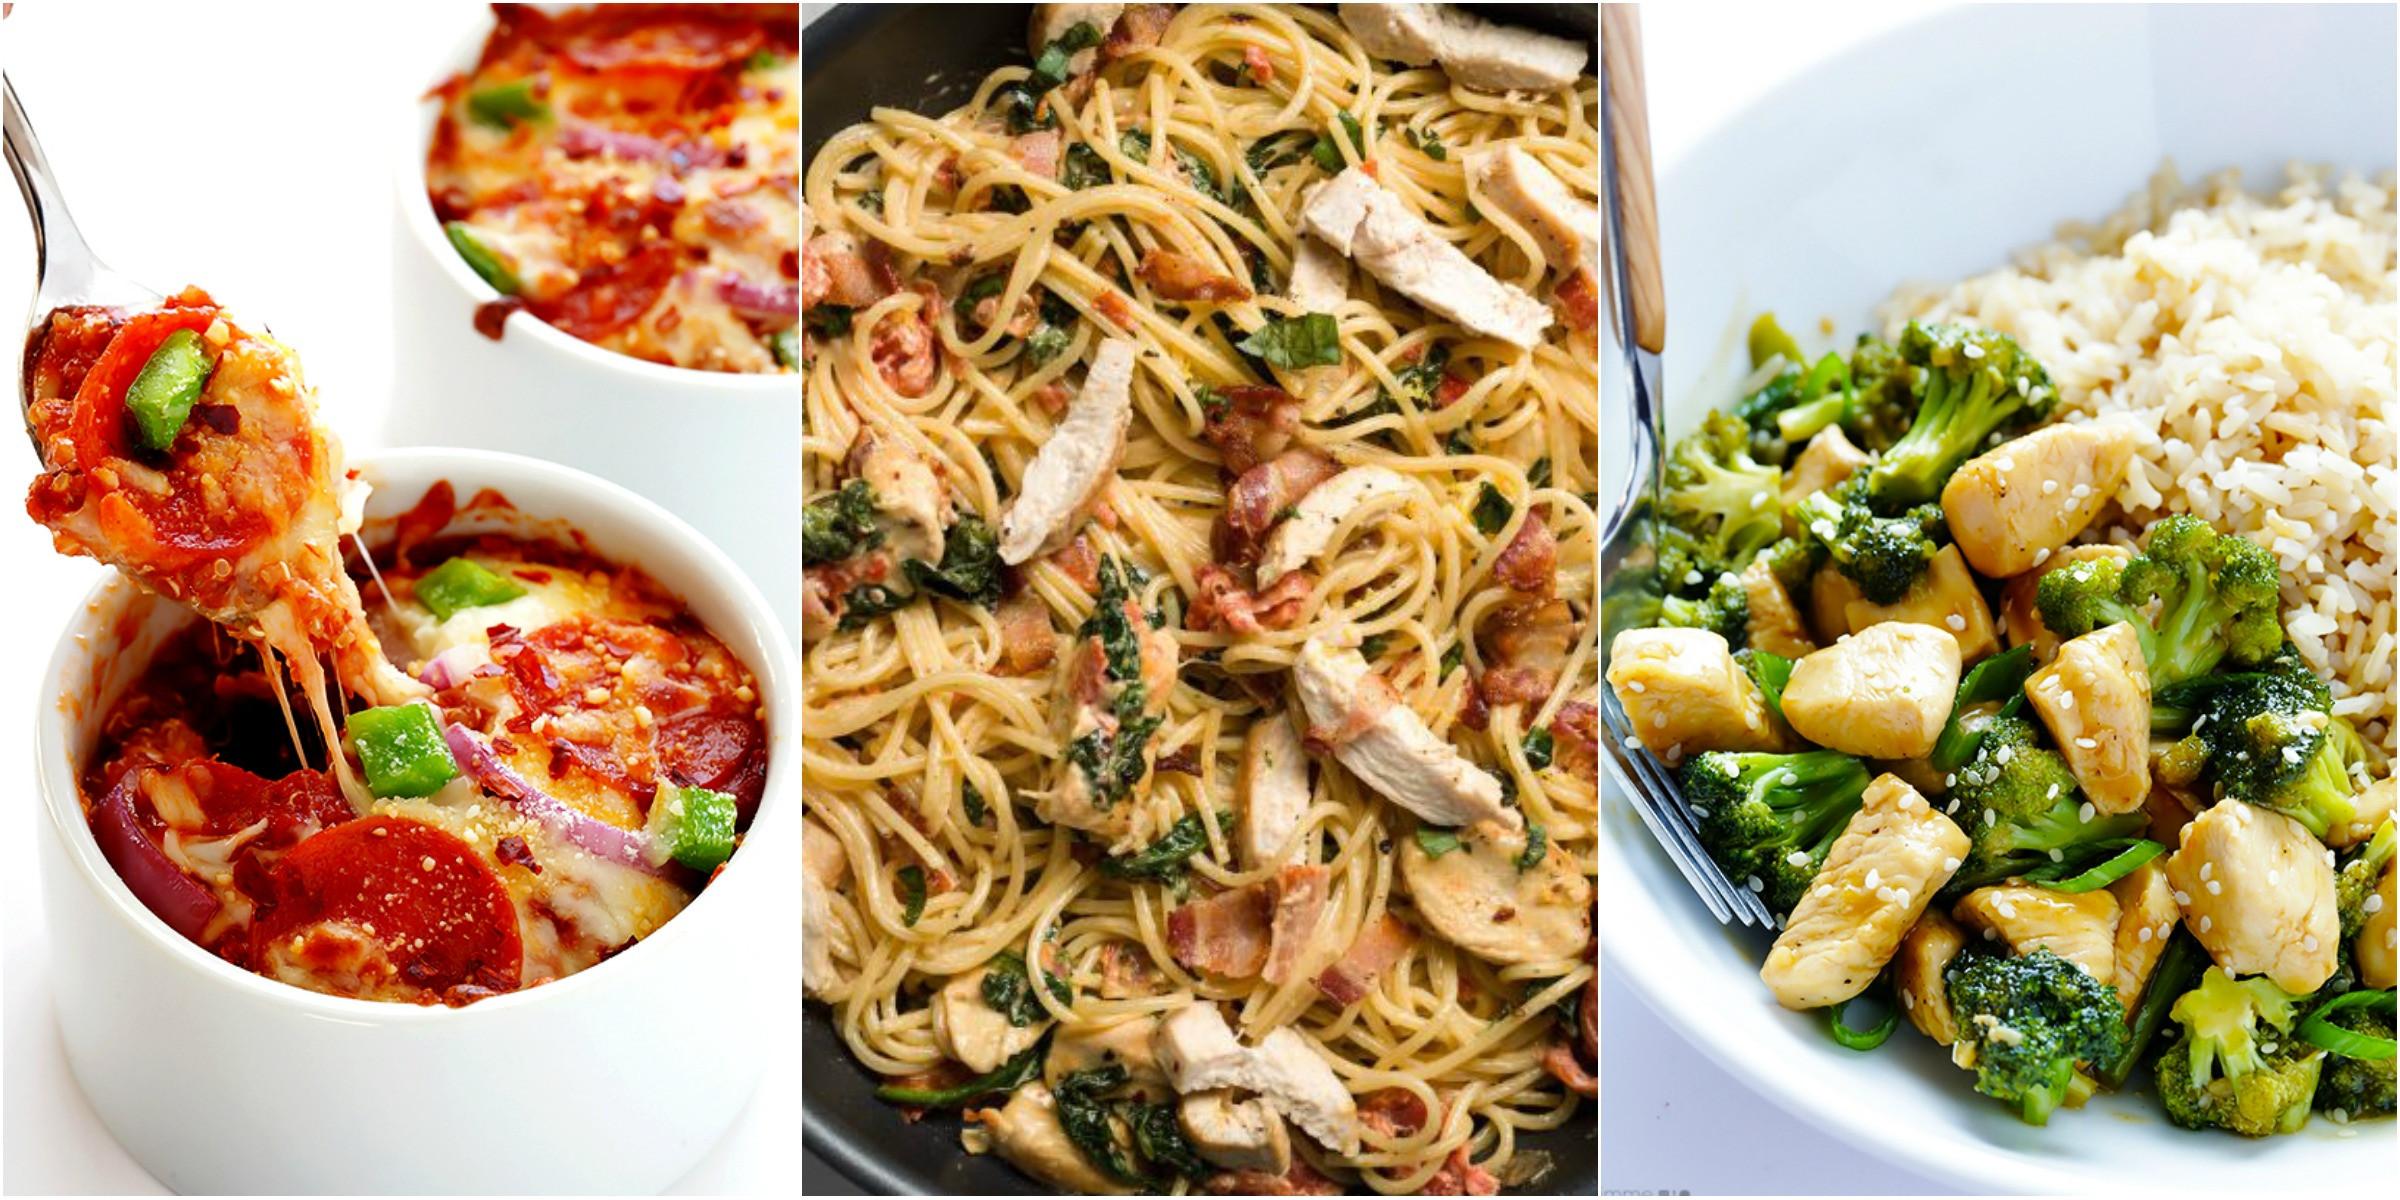 Fast Easy Dinner  20 Quick & Easy Dinner Ideas Recipes for Fast Family